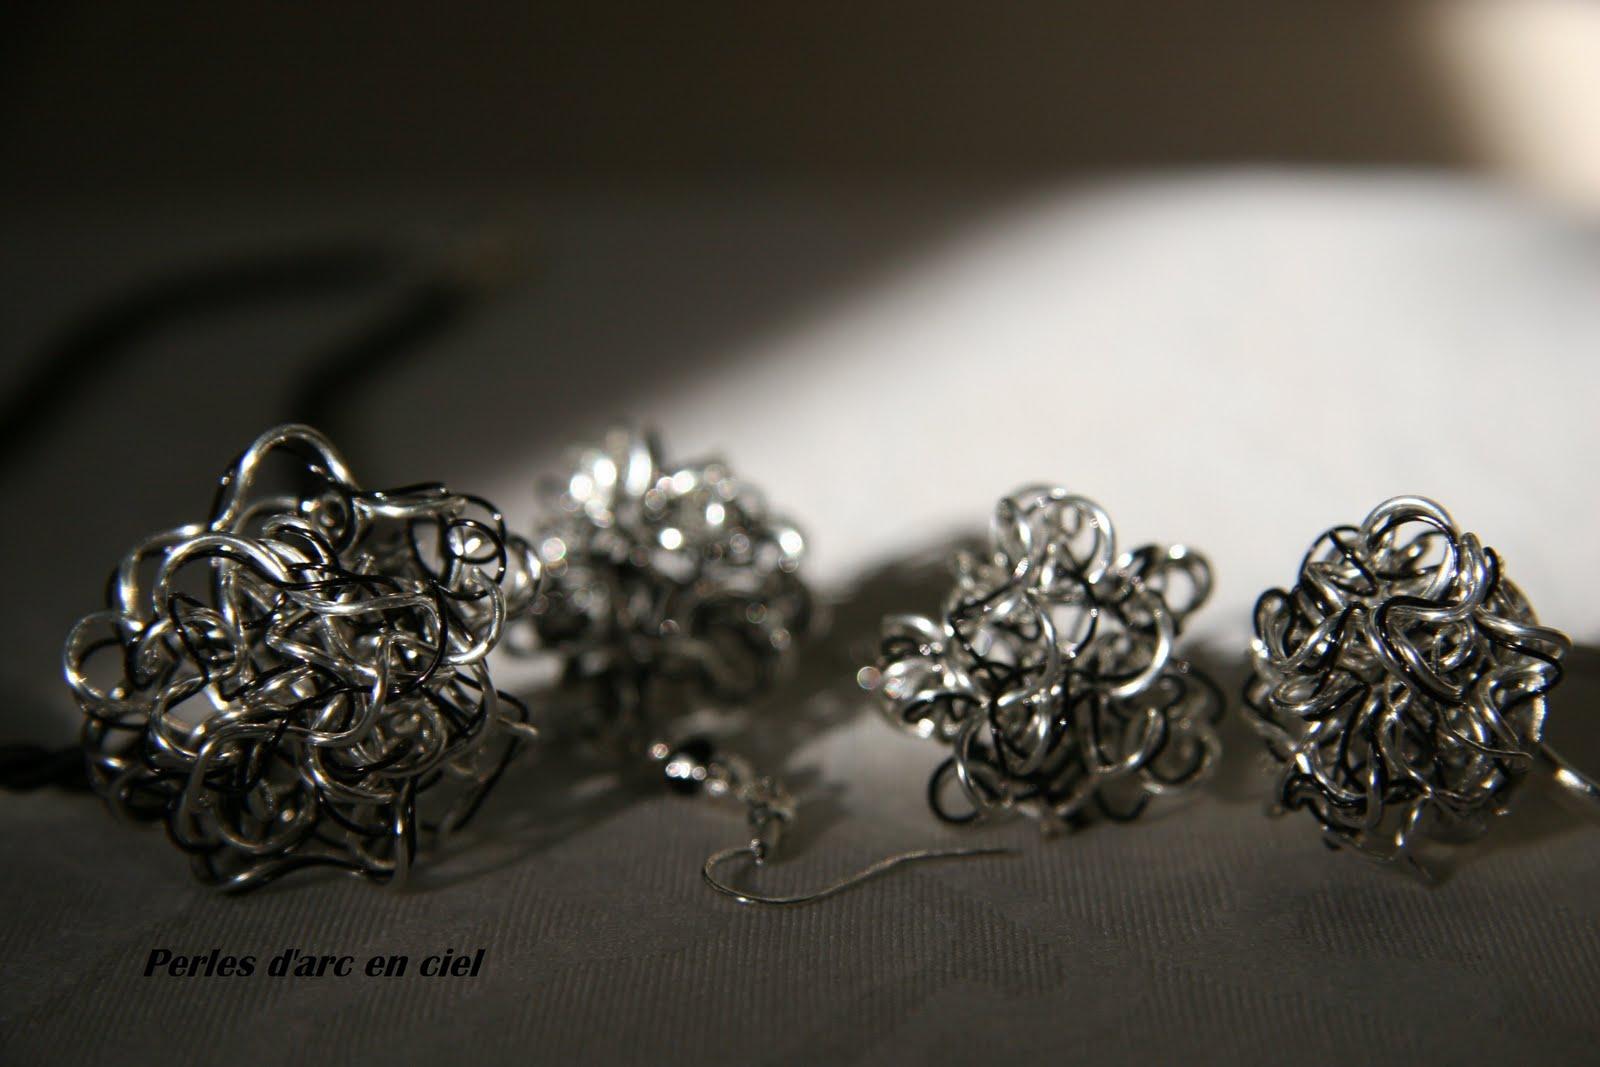 perles d 39 arc en ciel bijoux en fil de cuivre. Black Bedroom Furniture Sets. Home Design Ideas